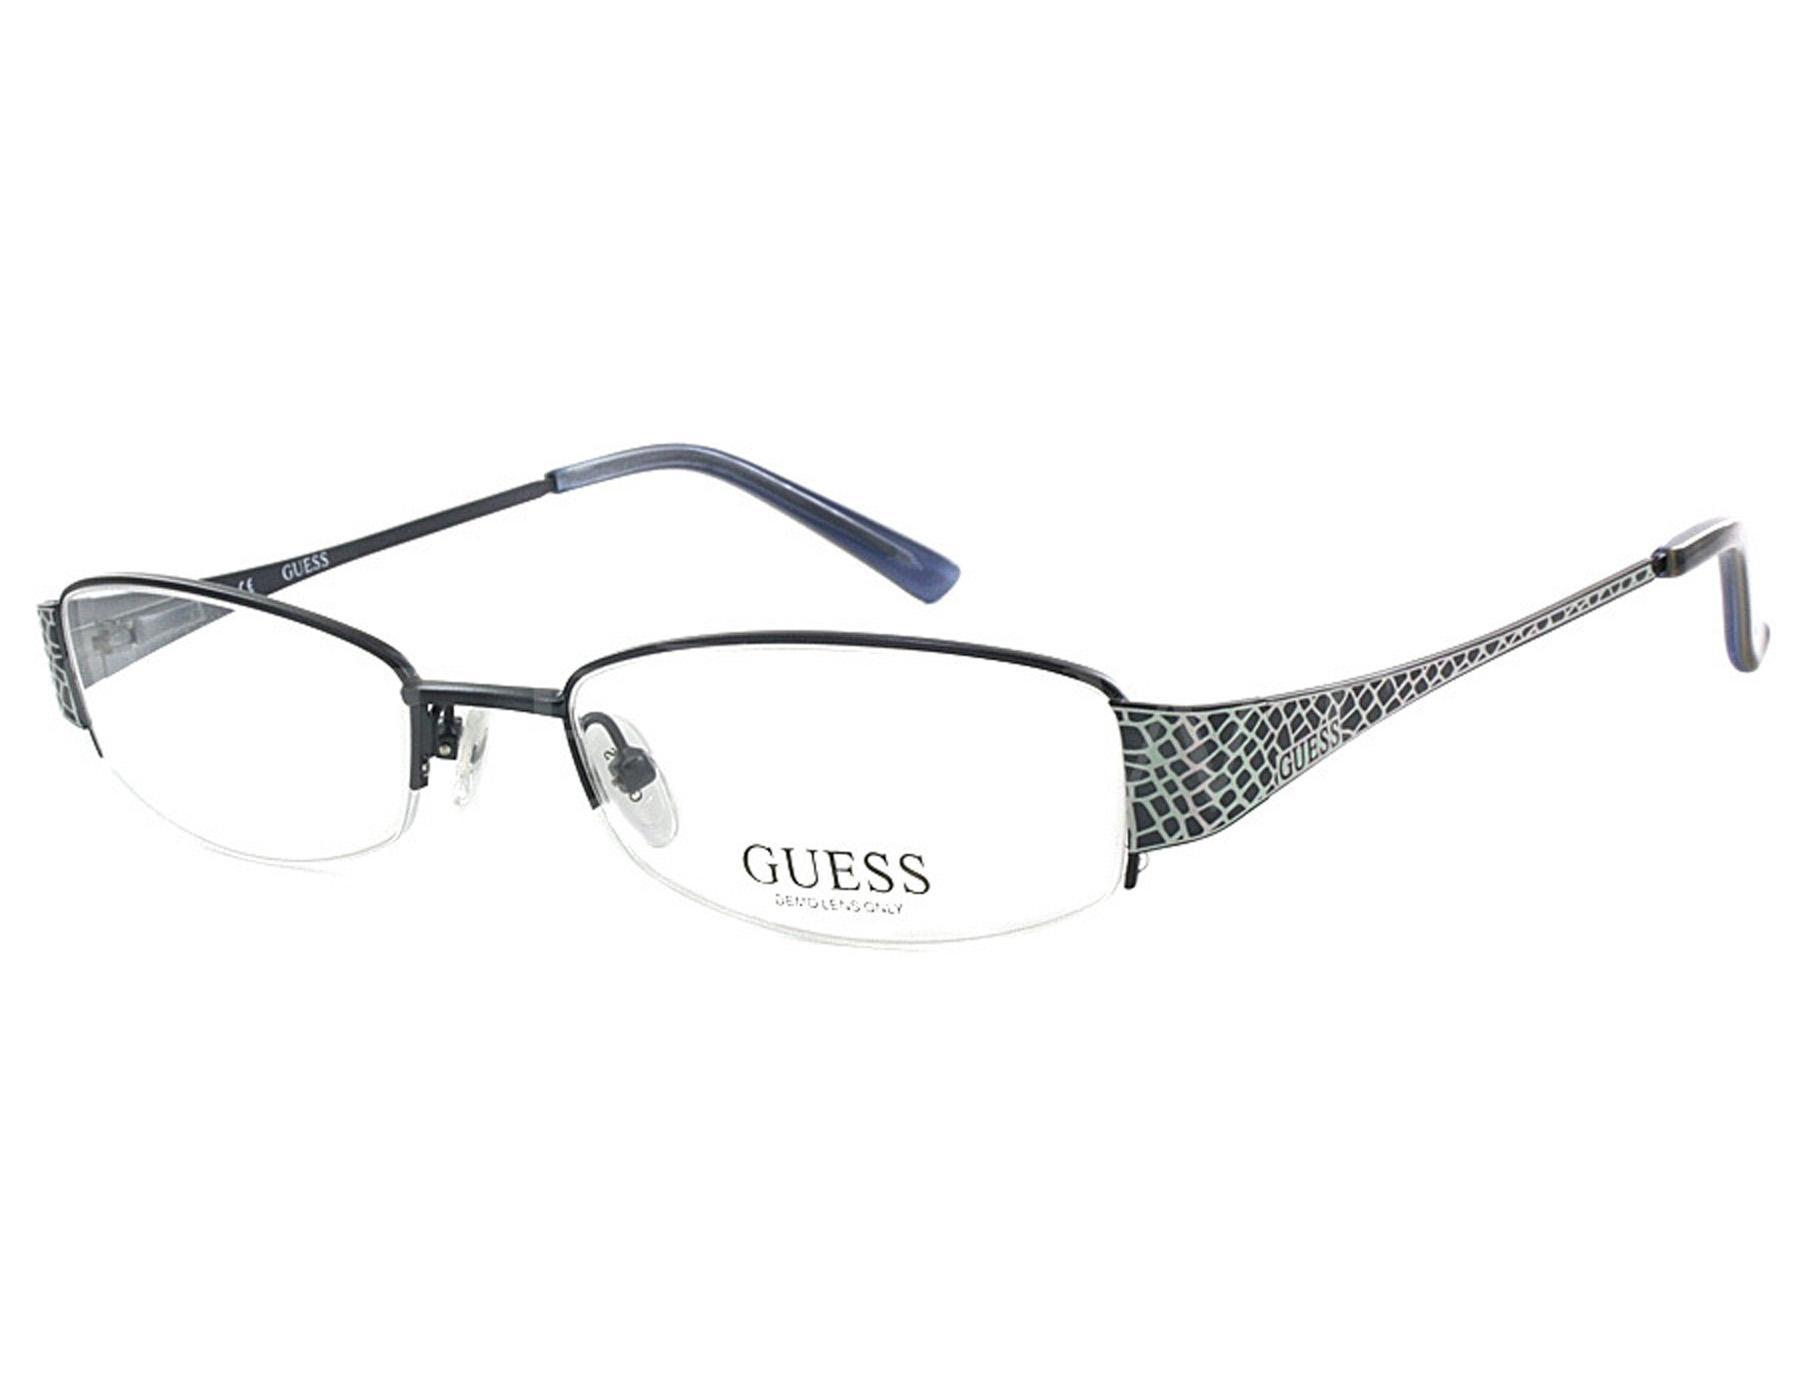 Guess Online Store In Pakistan Marciano Edp Women 100ml Gu2270 Bl Optical Eyeglasses Frames